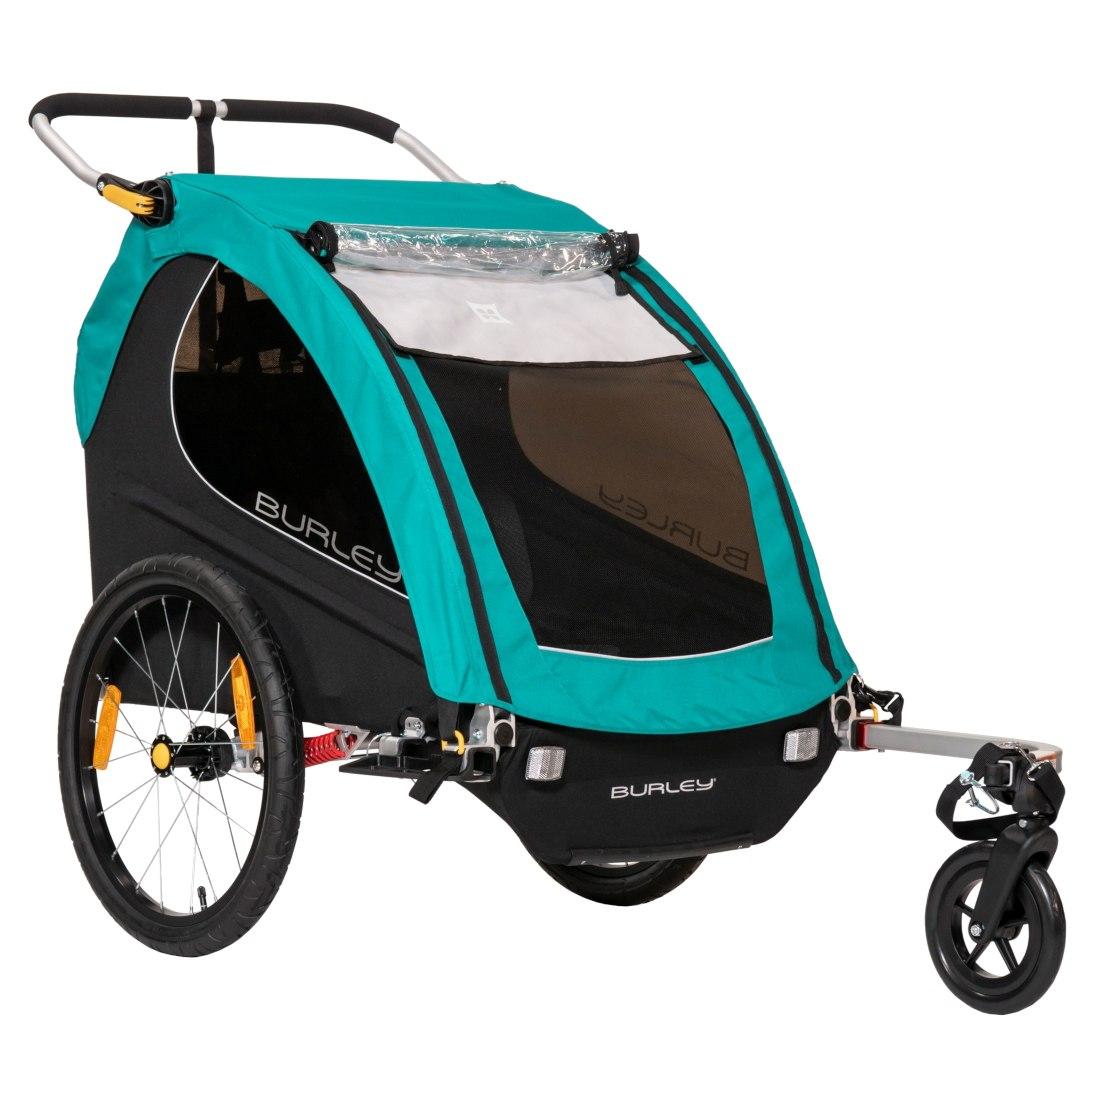 Foto de Burley Encore X Remolque de Bicicleta para 1-2 Niños con Capota - turquoise